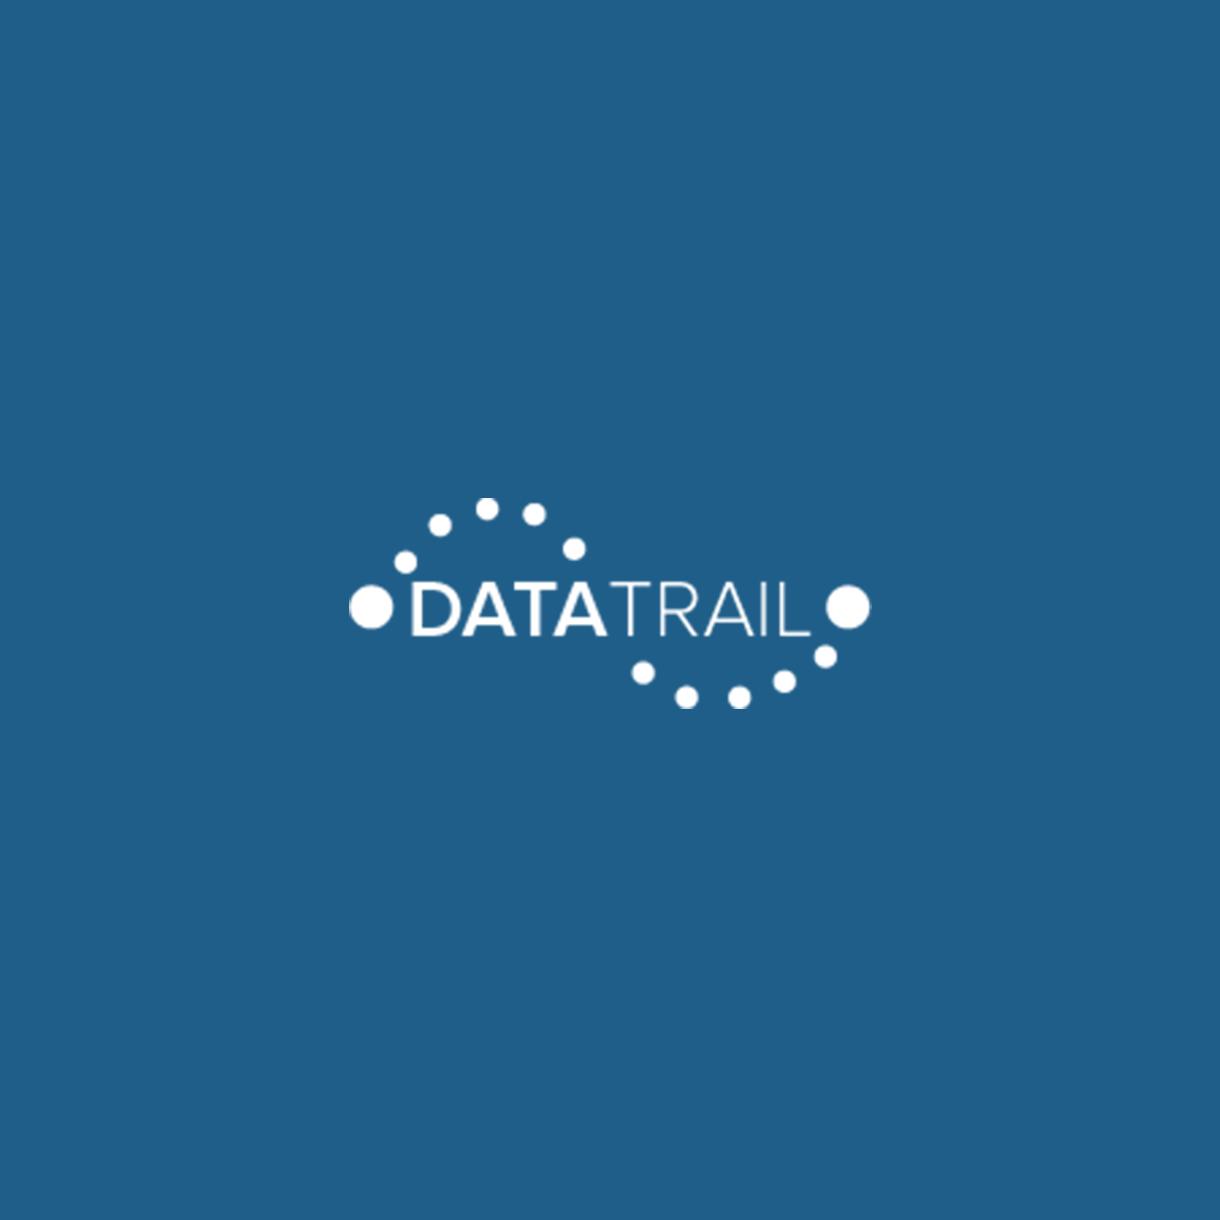 Data Trail